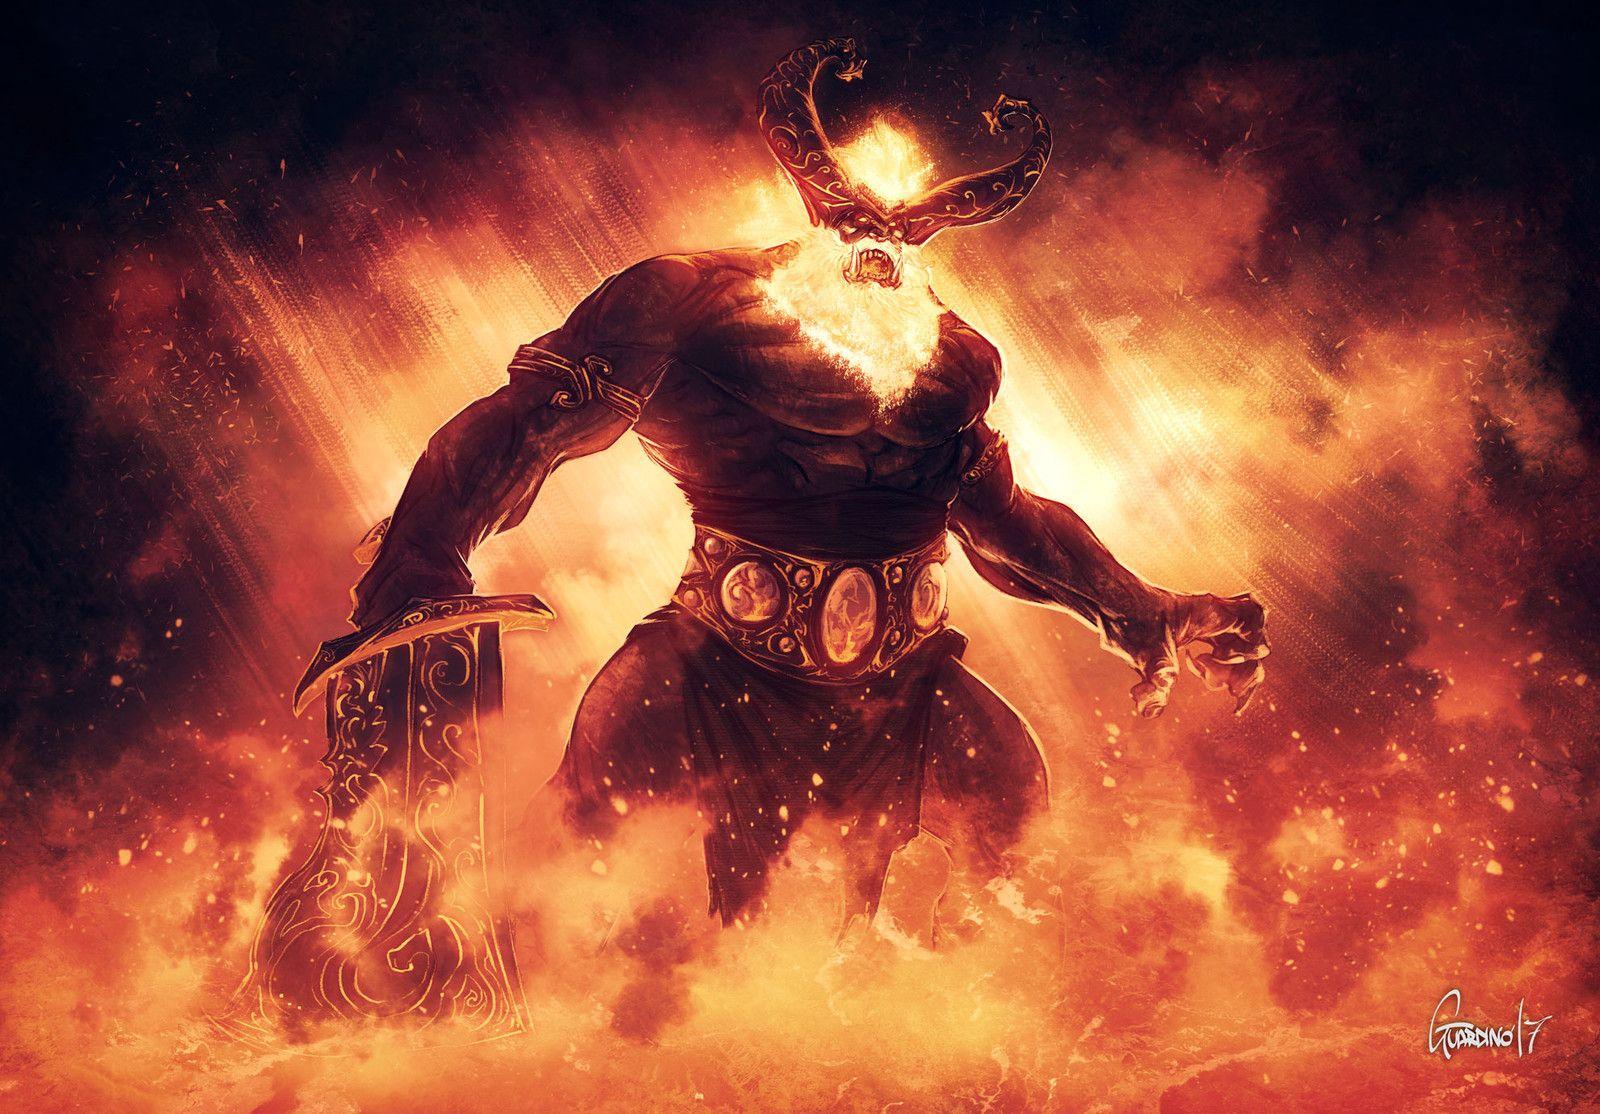 Image of giant Surt Muspelheim lord